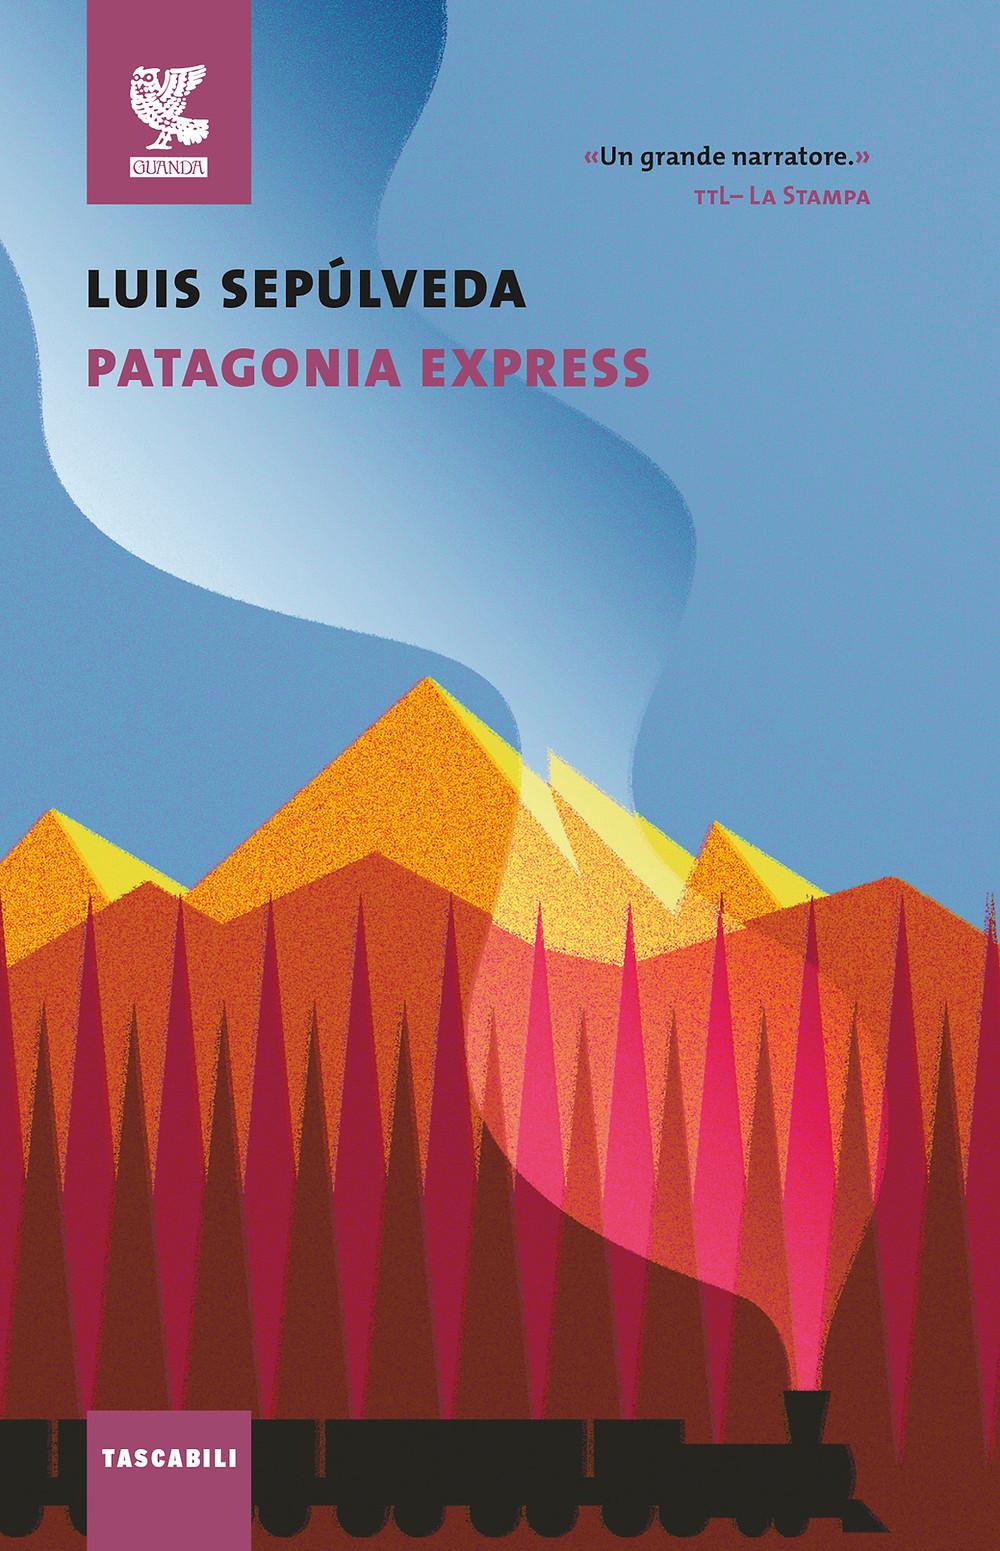 Patagonia Express Luis Sepulveda recensione